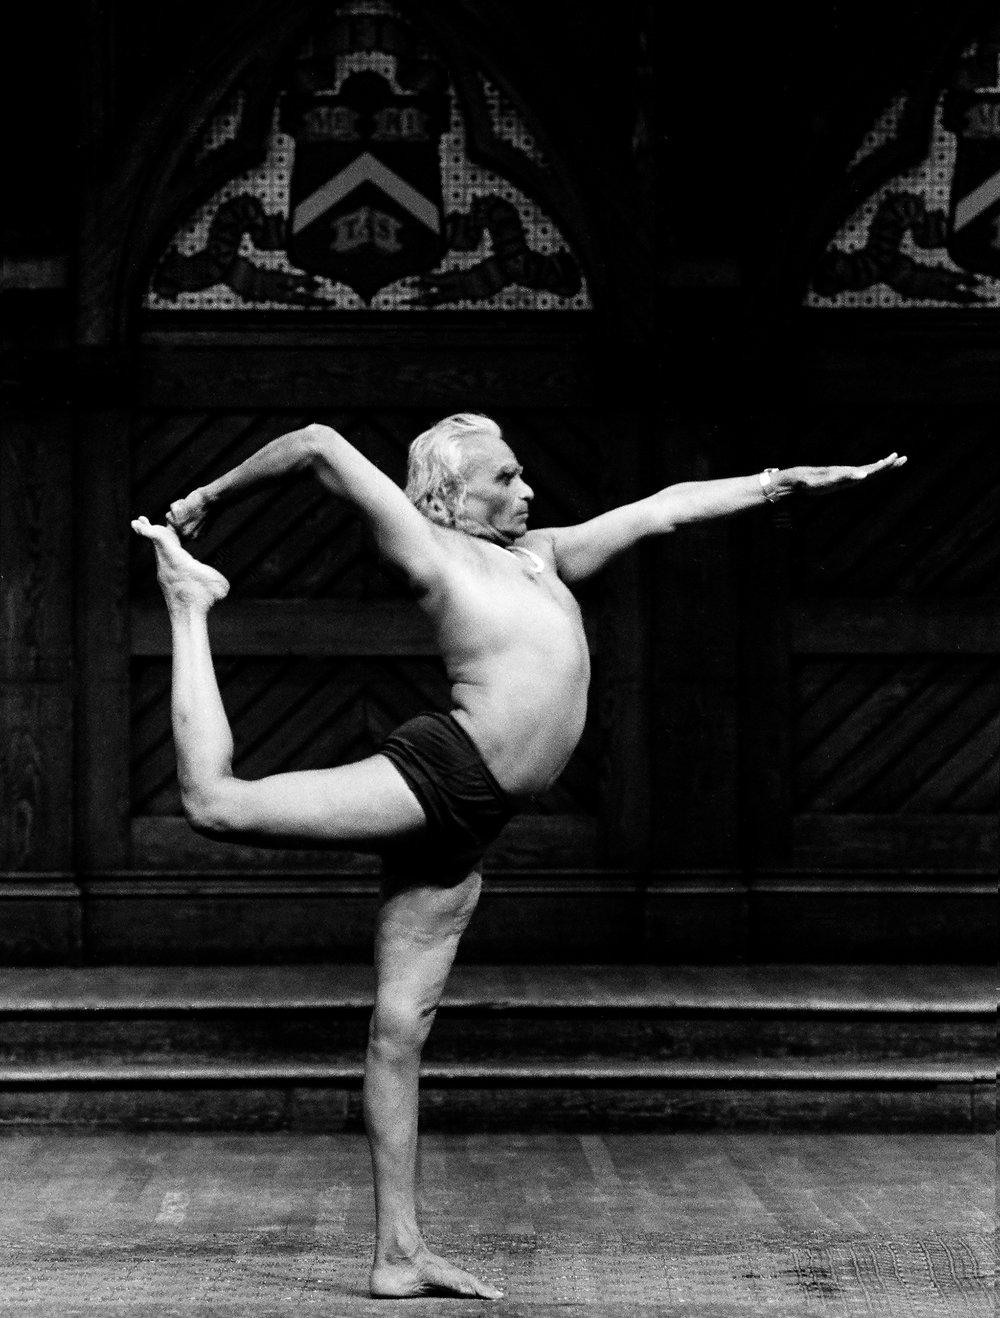 B.K.S. Iyengar photographed at Yoga '87, Harvard University, 1987 by Peter Schweitzer